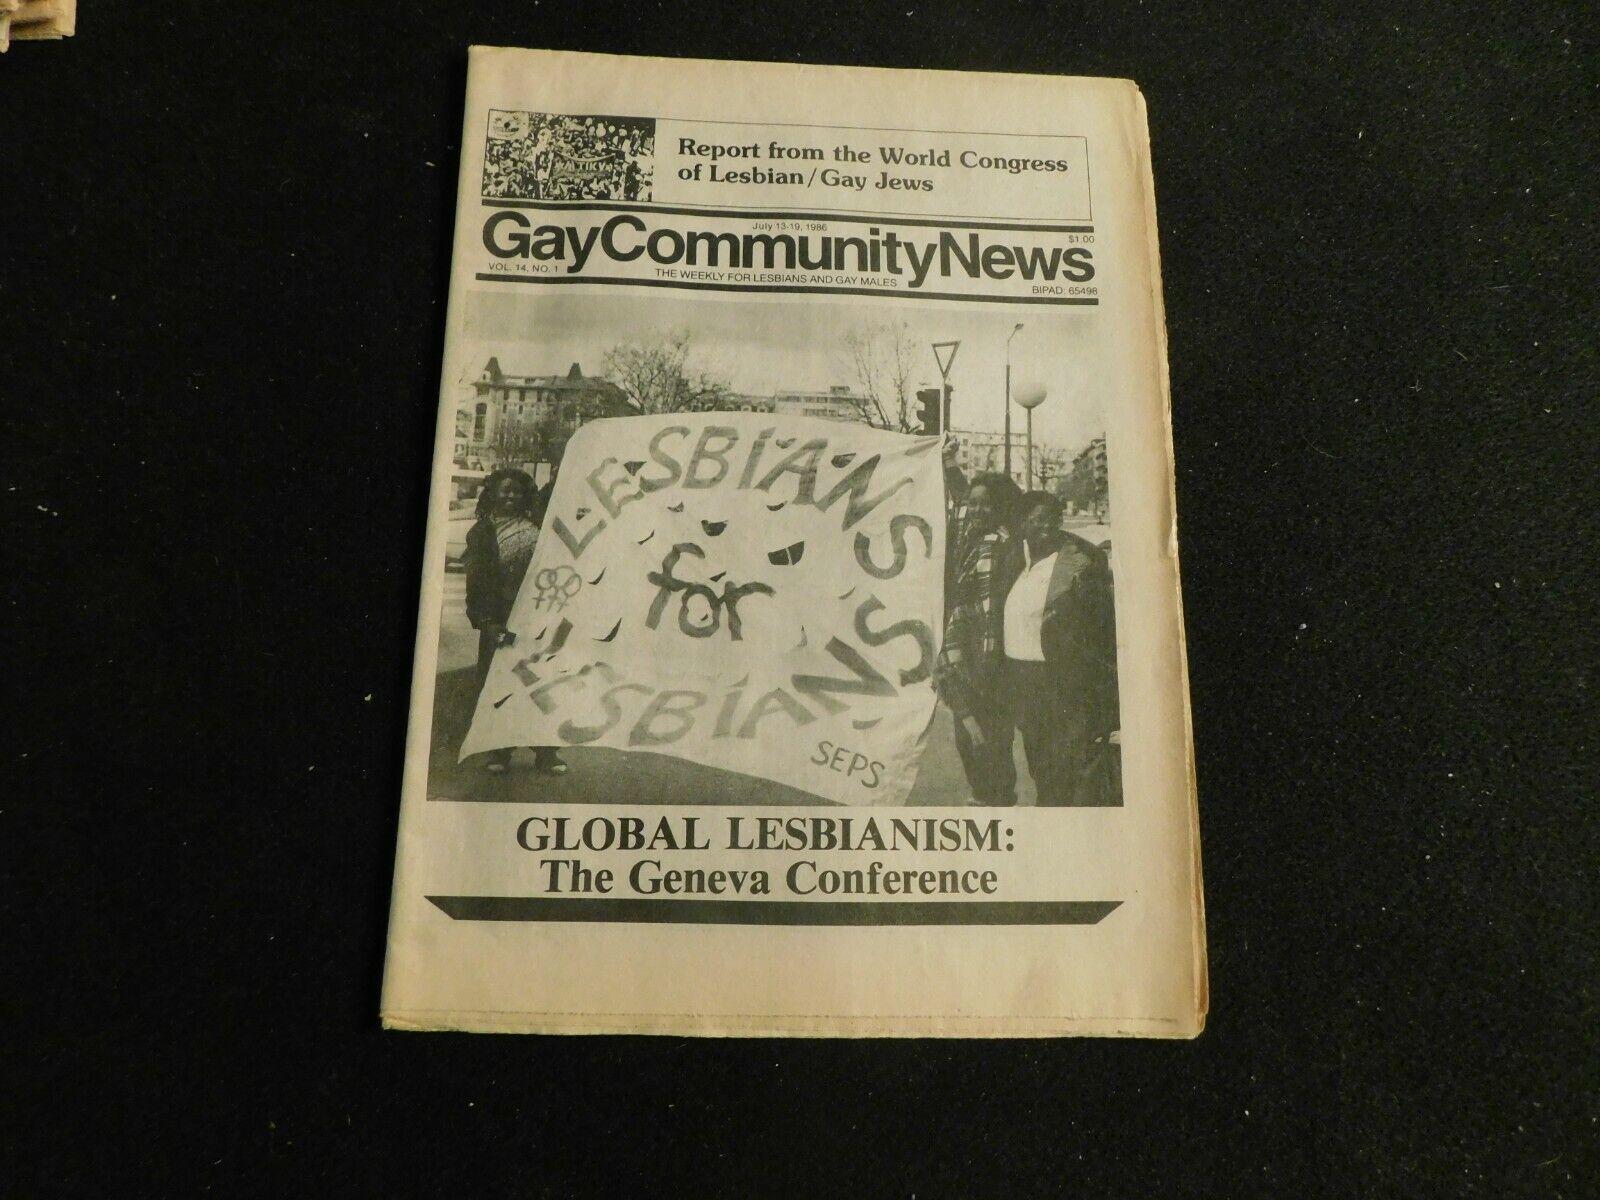 Gay Community News Vol 14 No 1 1986 Gay Newspaper - $9.99